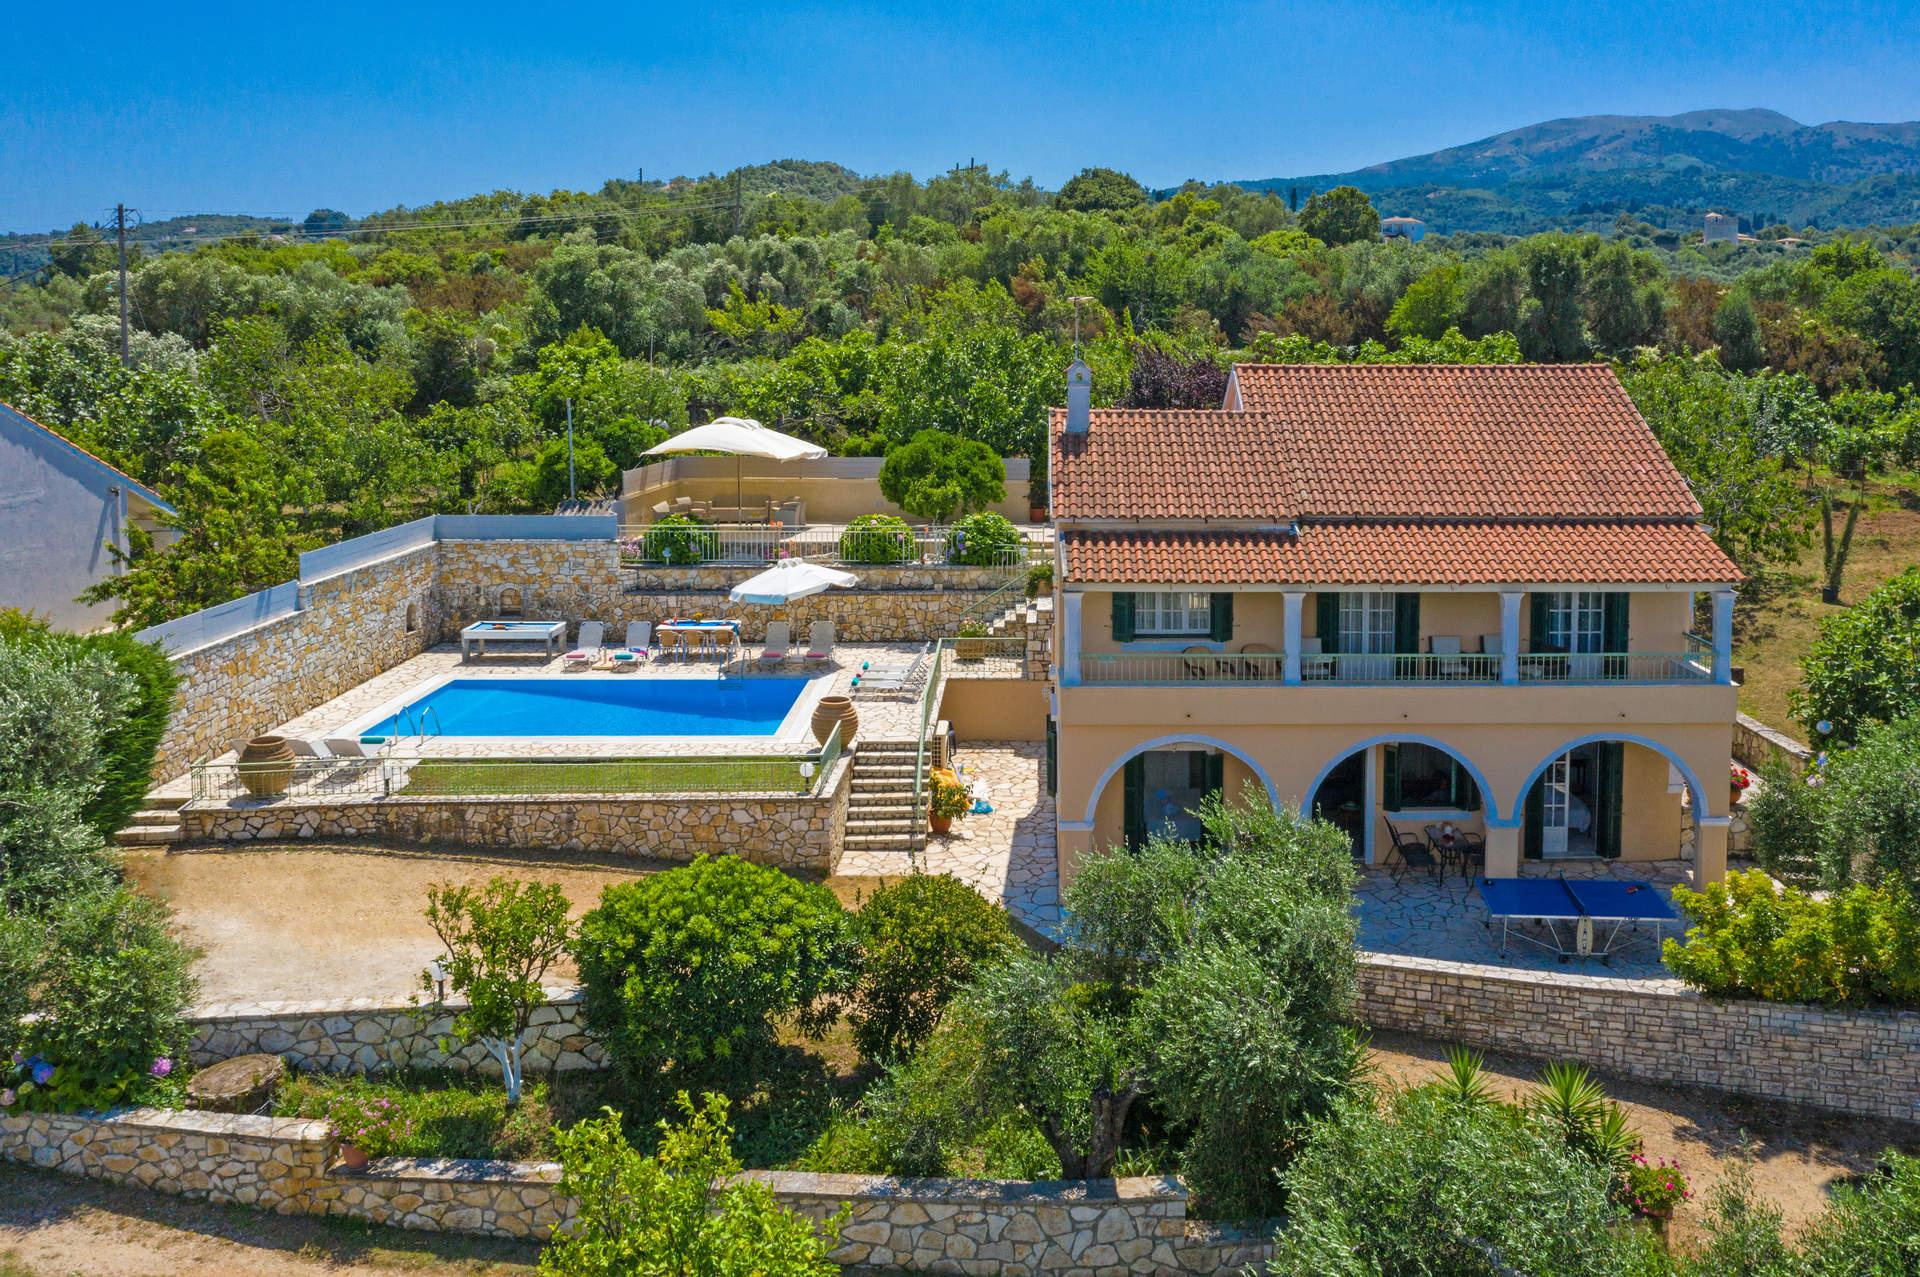 Villa Ftelias, Agios Stefanos, Corfu, Greece